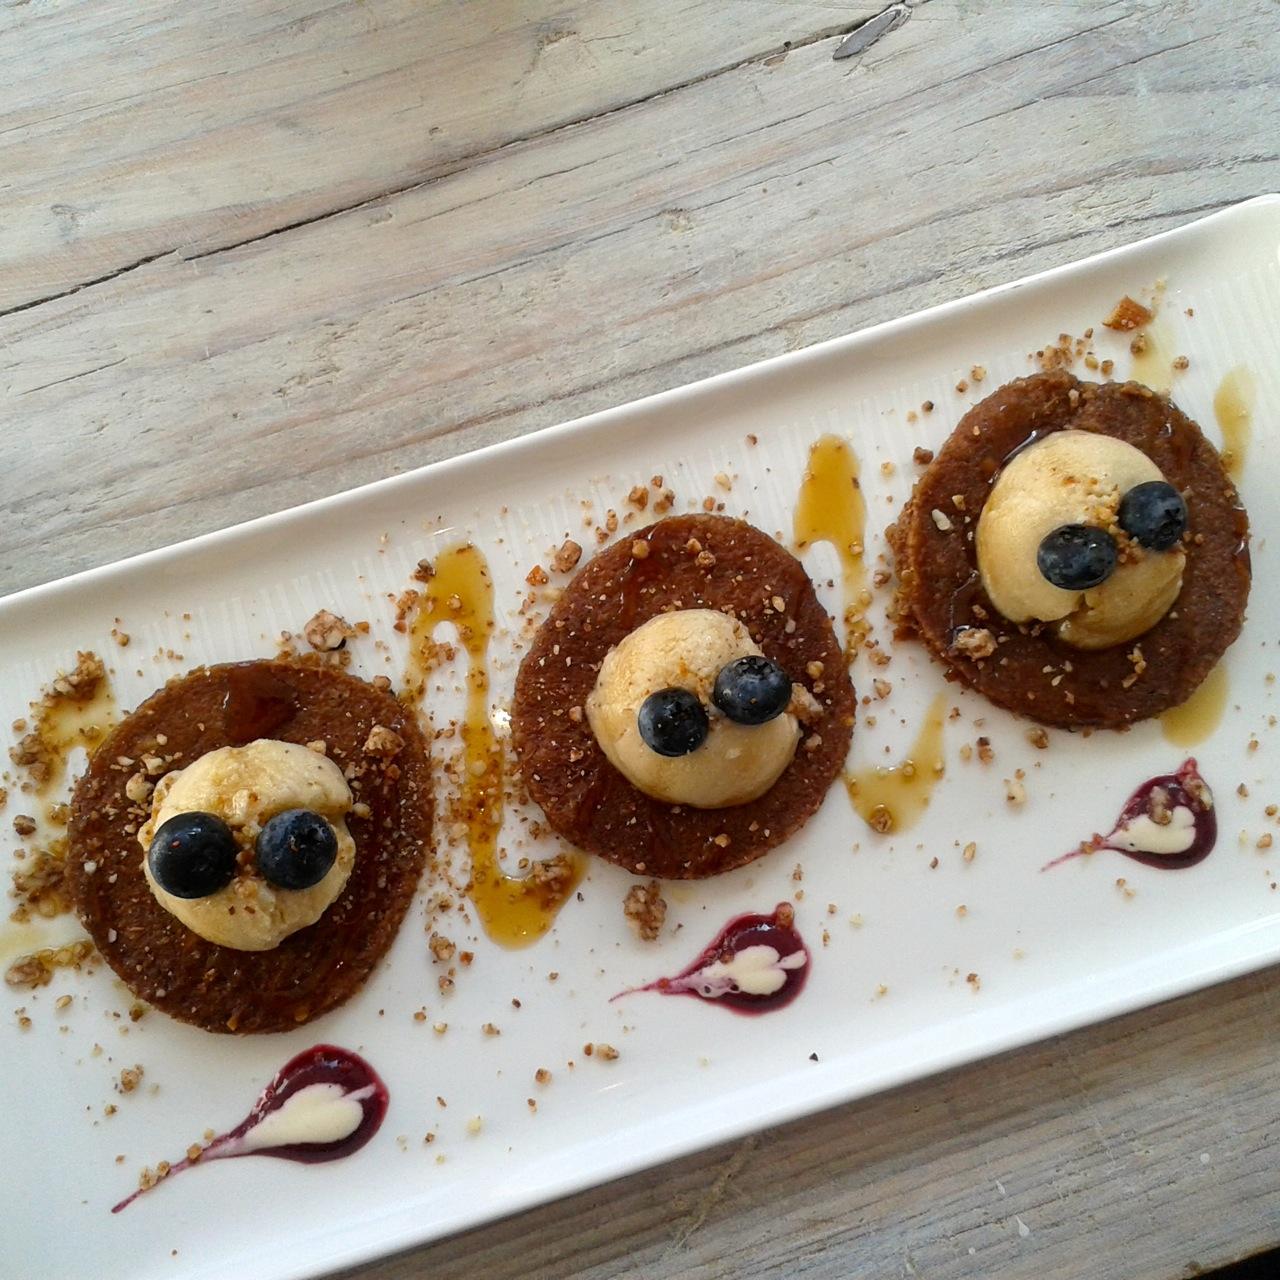 http://fatgayvegan.com/wp-content/uploads/2014/09/pancakes.jpg